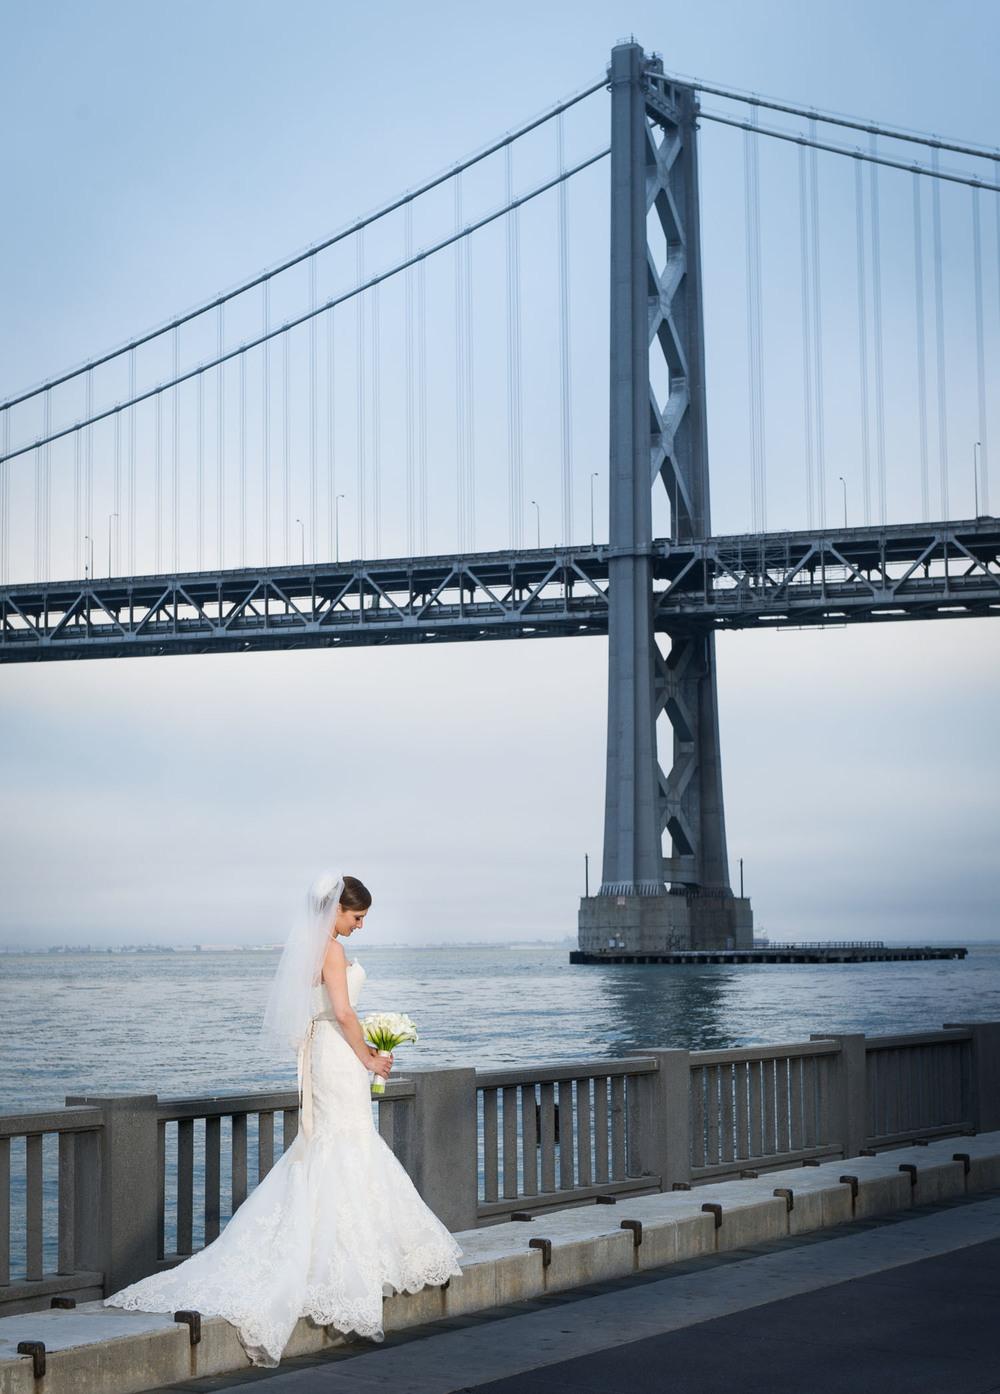 stewart_bertrand_wedding_photography_sp-1005.jpg